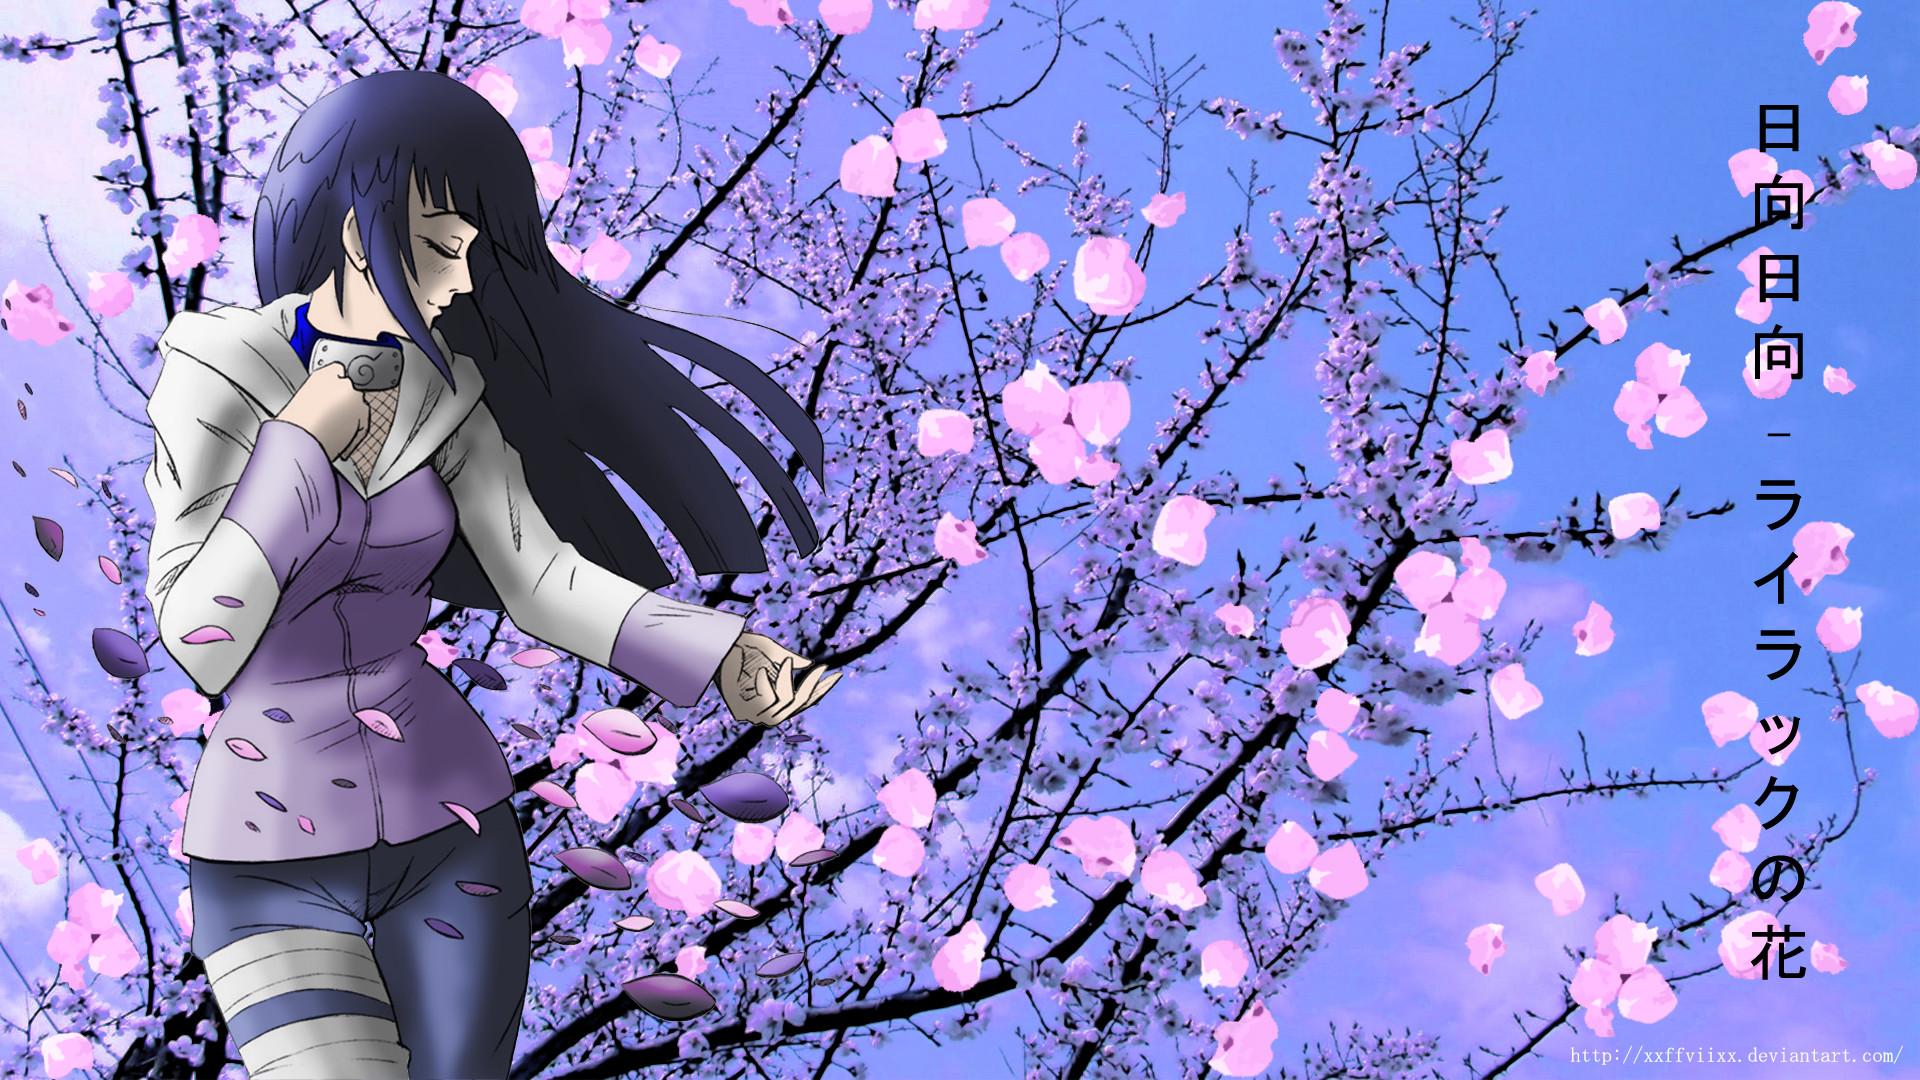 Free Download Wallpaper Naruto And Hinata Vinny Oleo Vegetal Info